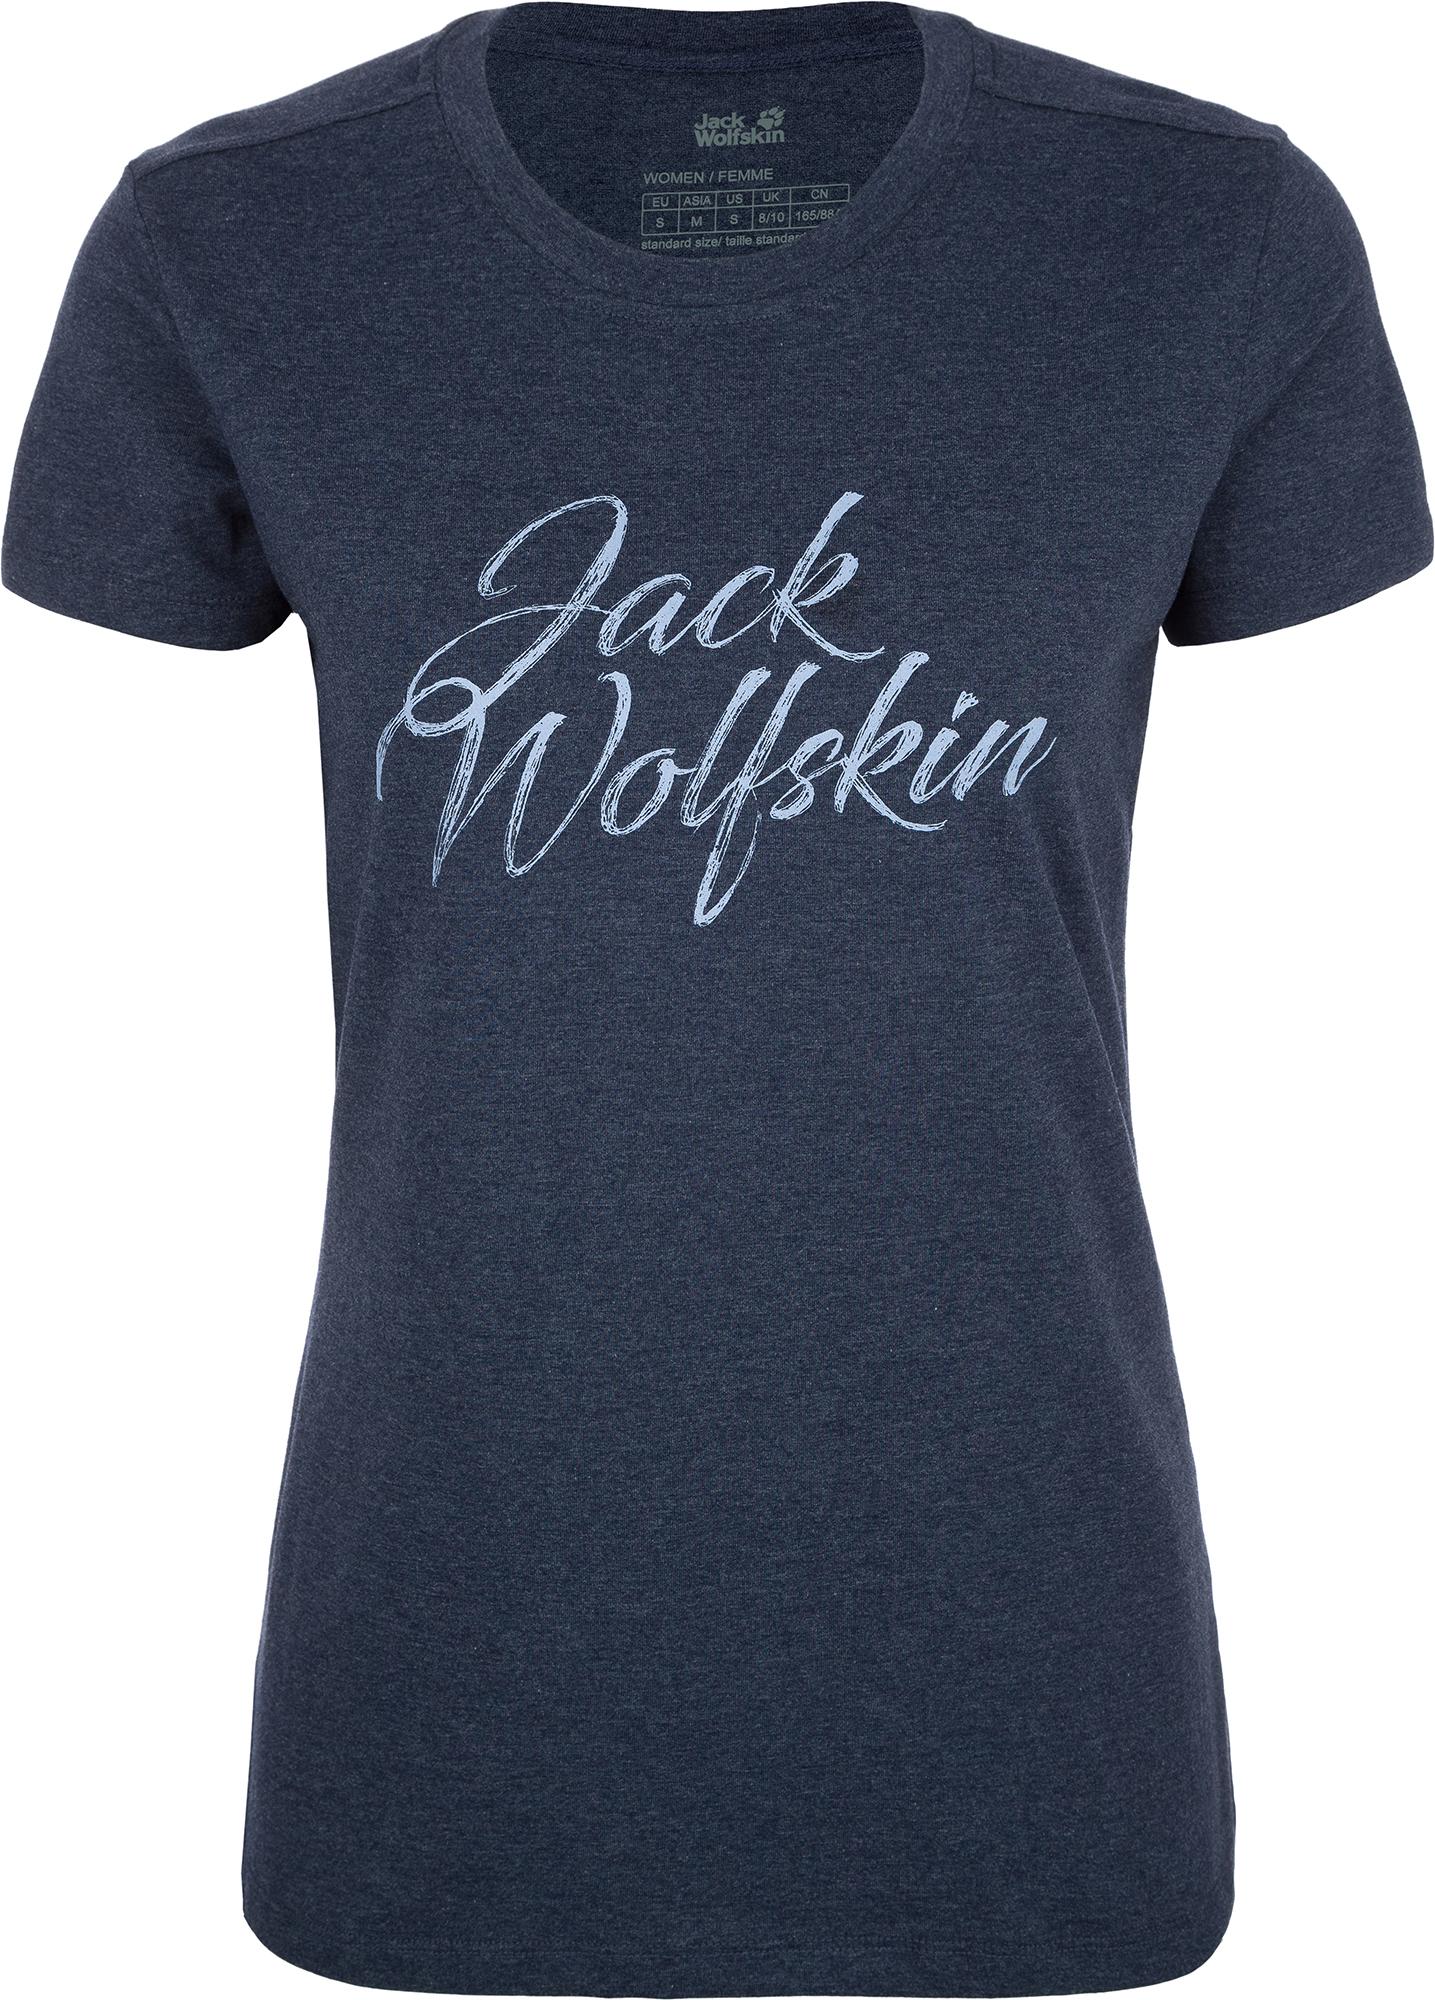 цены Jack Wolfskin Футболка женская JACK WOLFSKIN Brand, размер 46-48